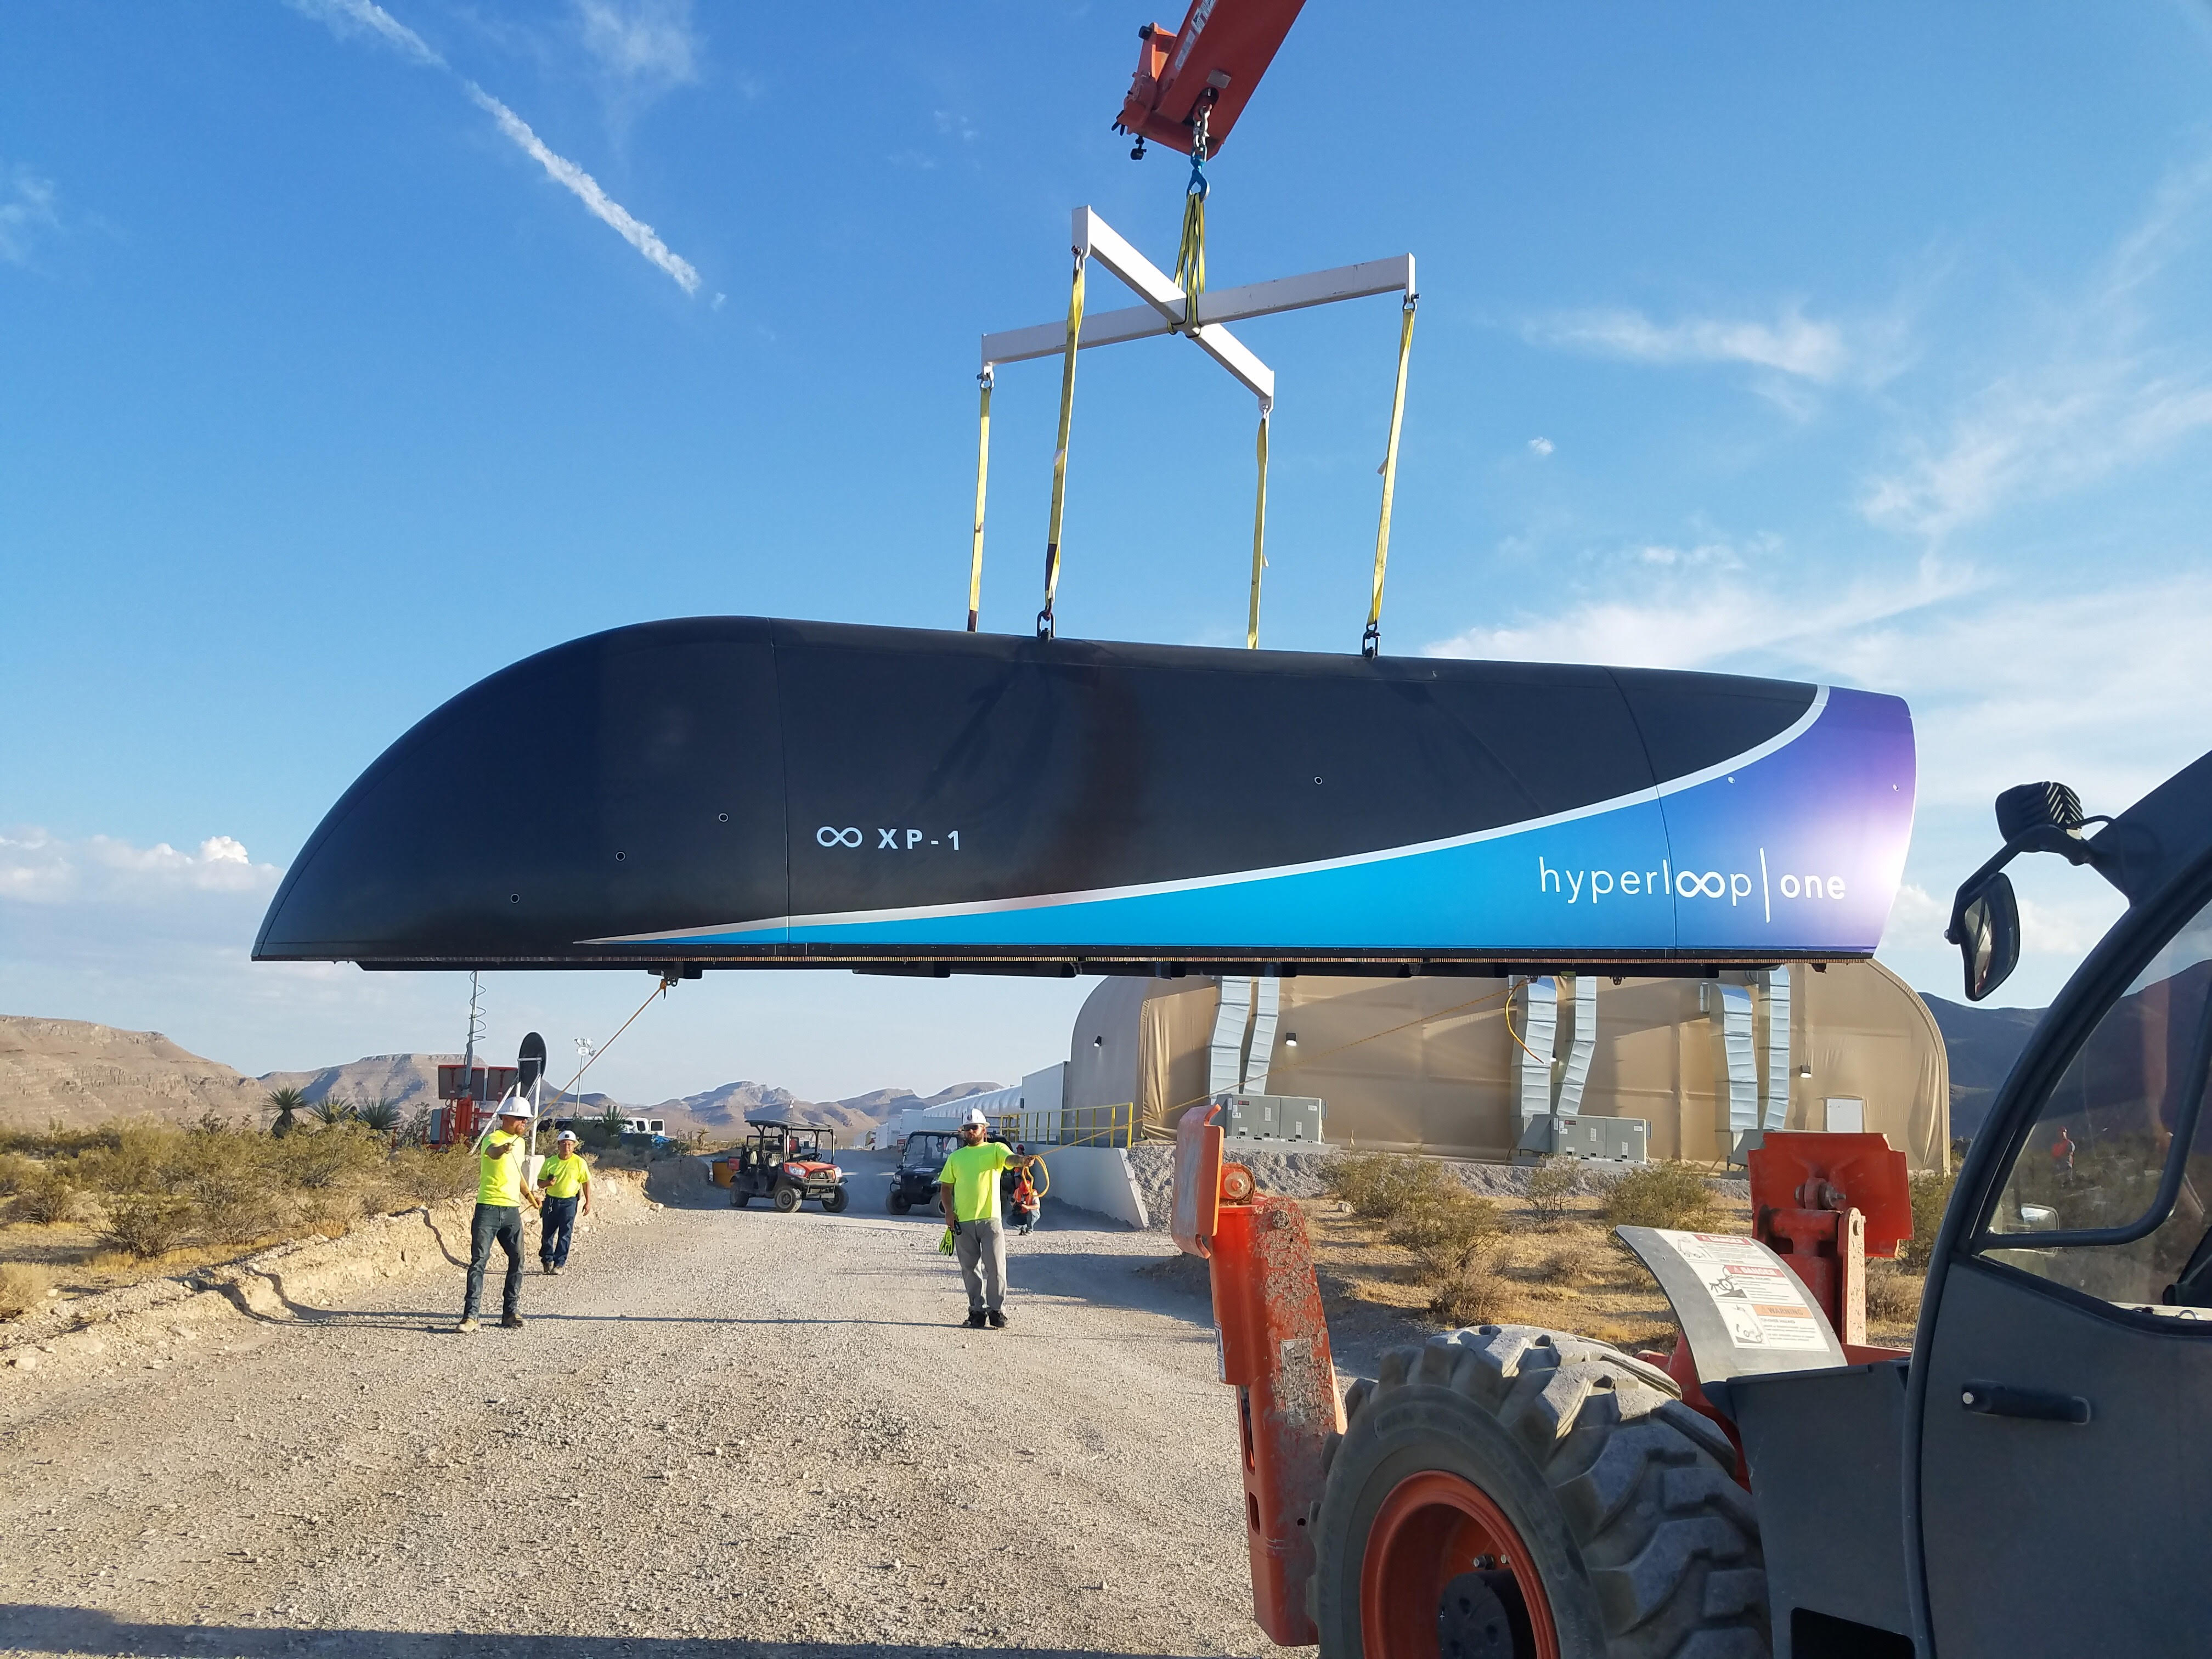 Hyperloop One – The Future of Transportation